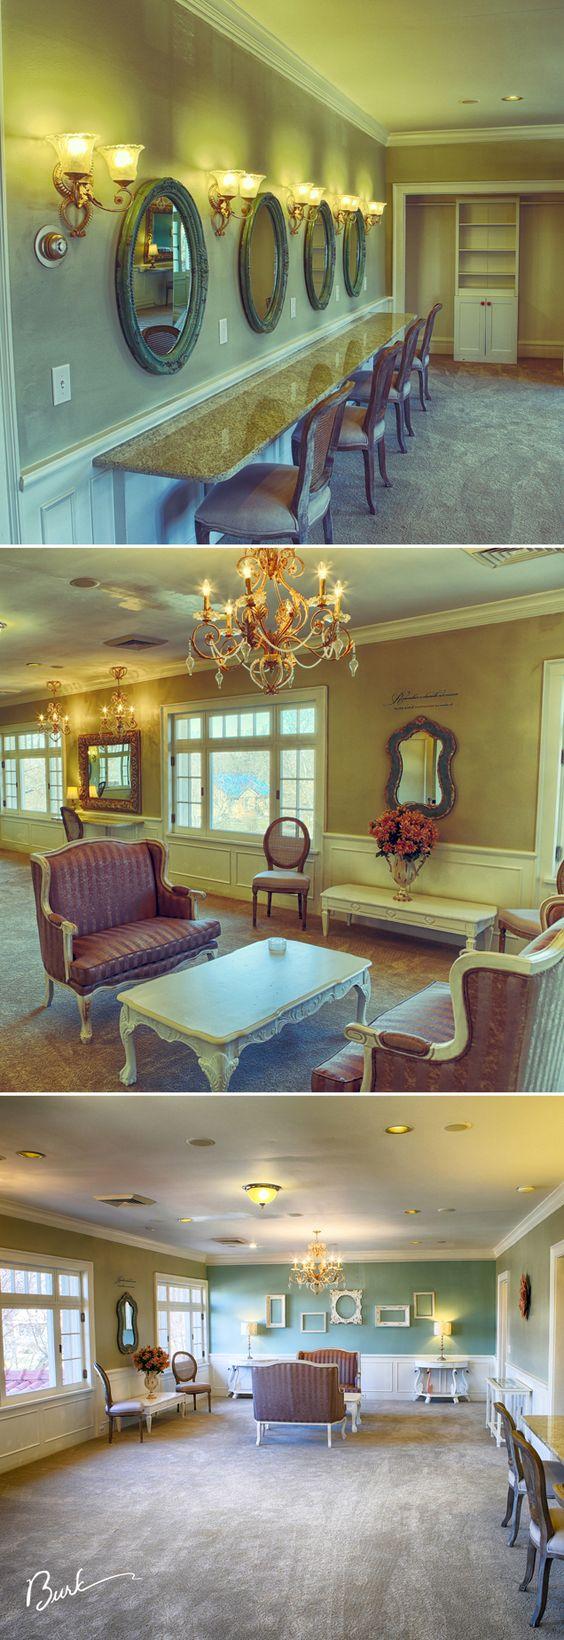 #BellingtonManor #utahreceptioncenter #ogdenutah #weddingvenue #bridesroom @Bellington Manor